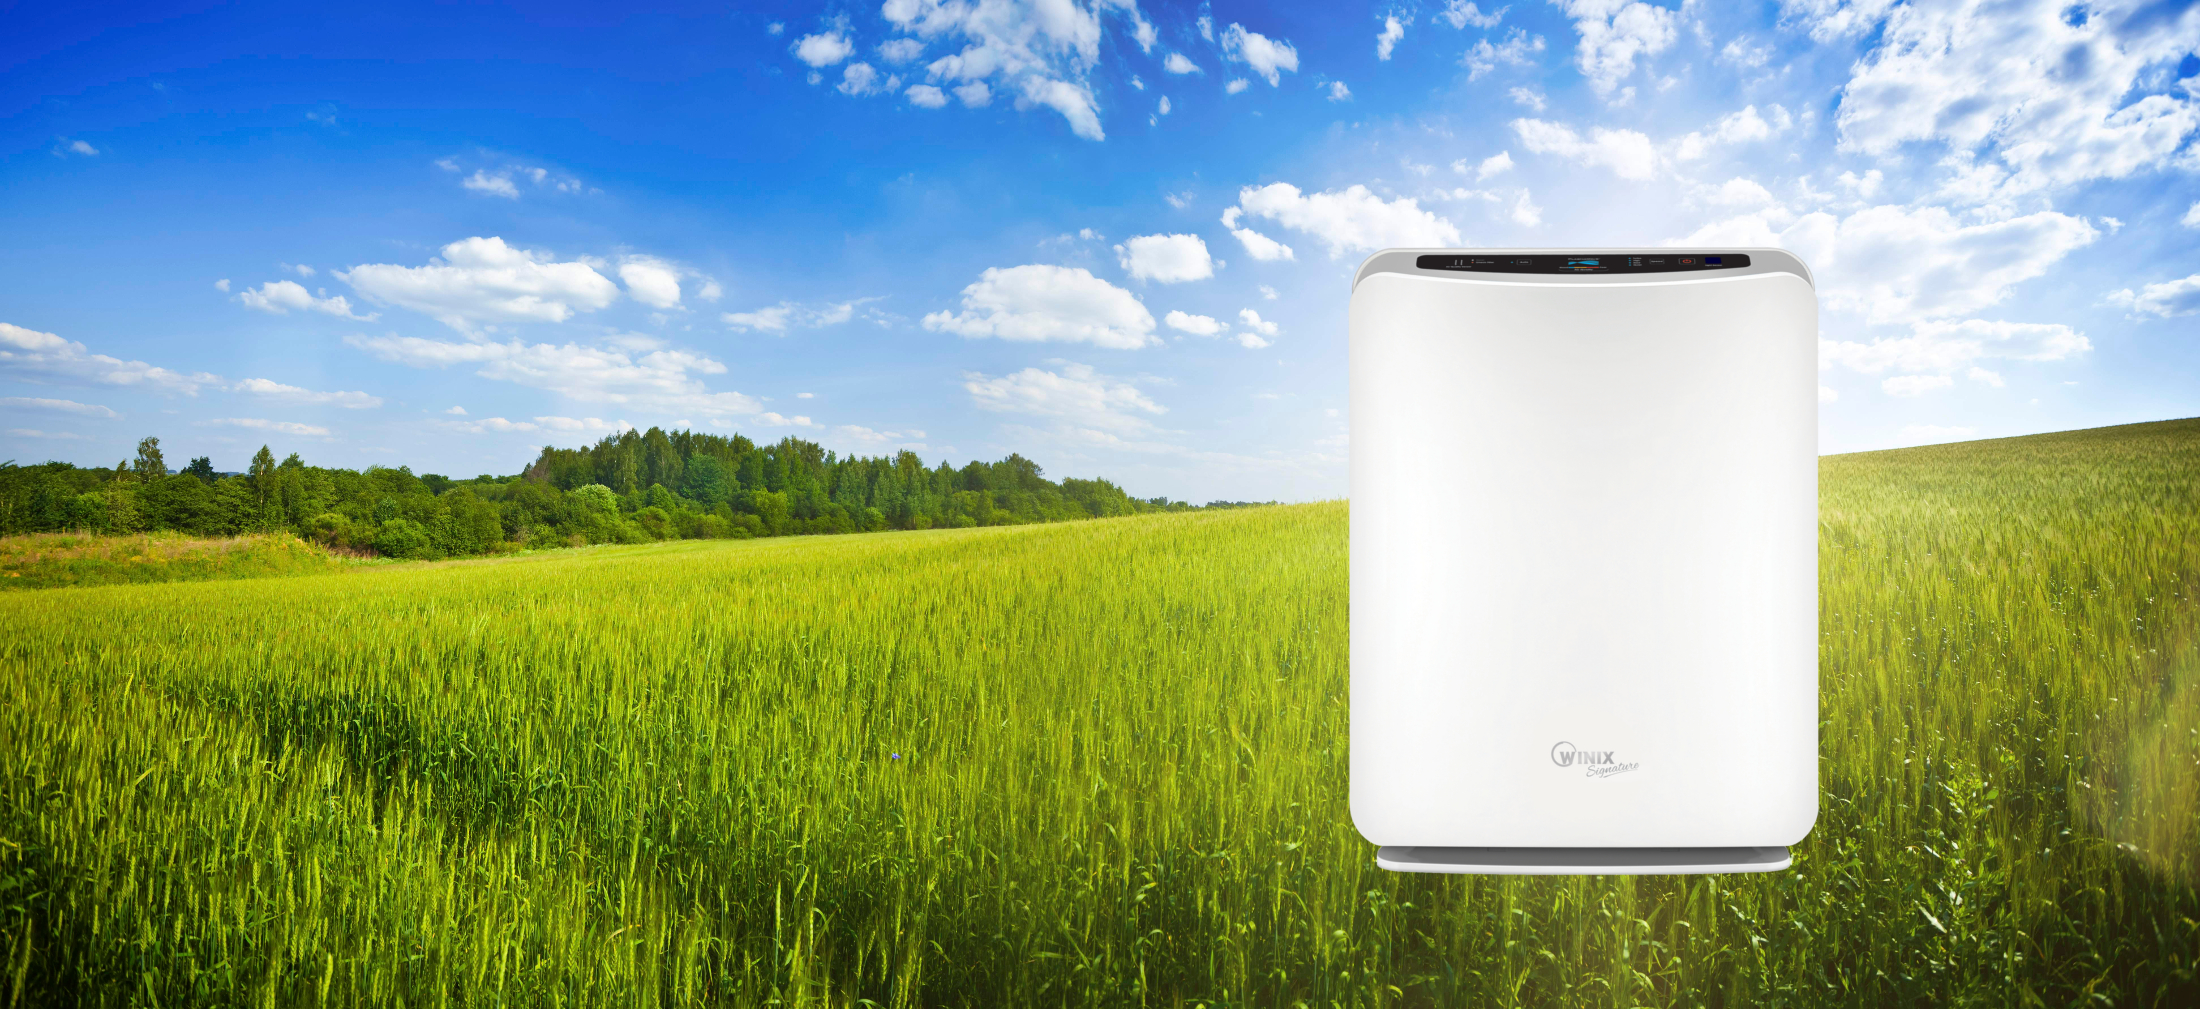 Aire limpio con purificadores de aire winix